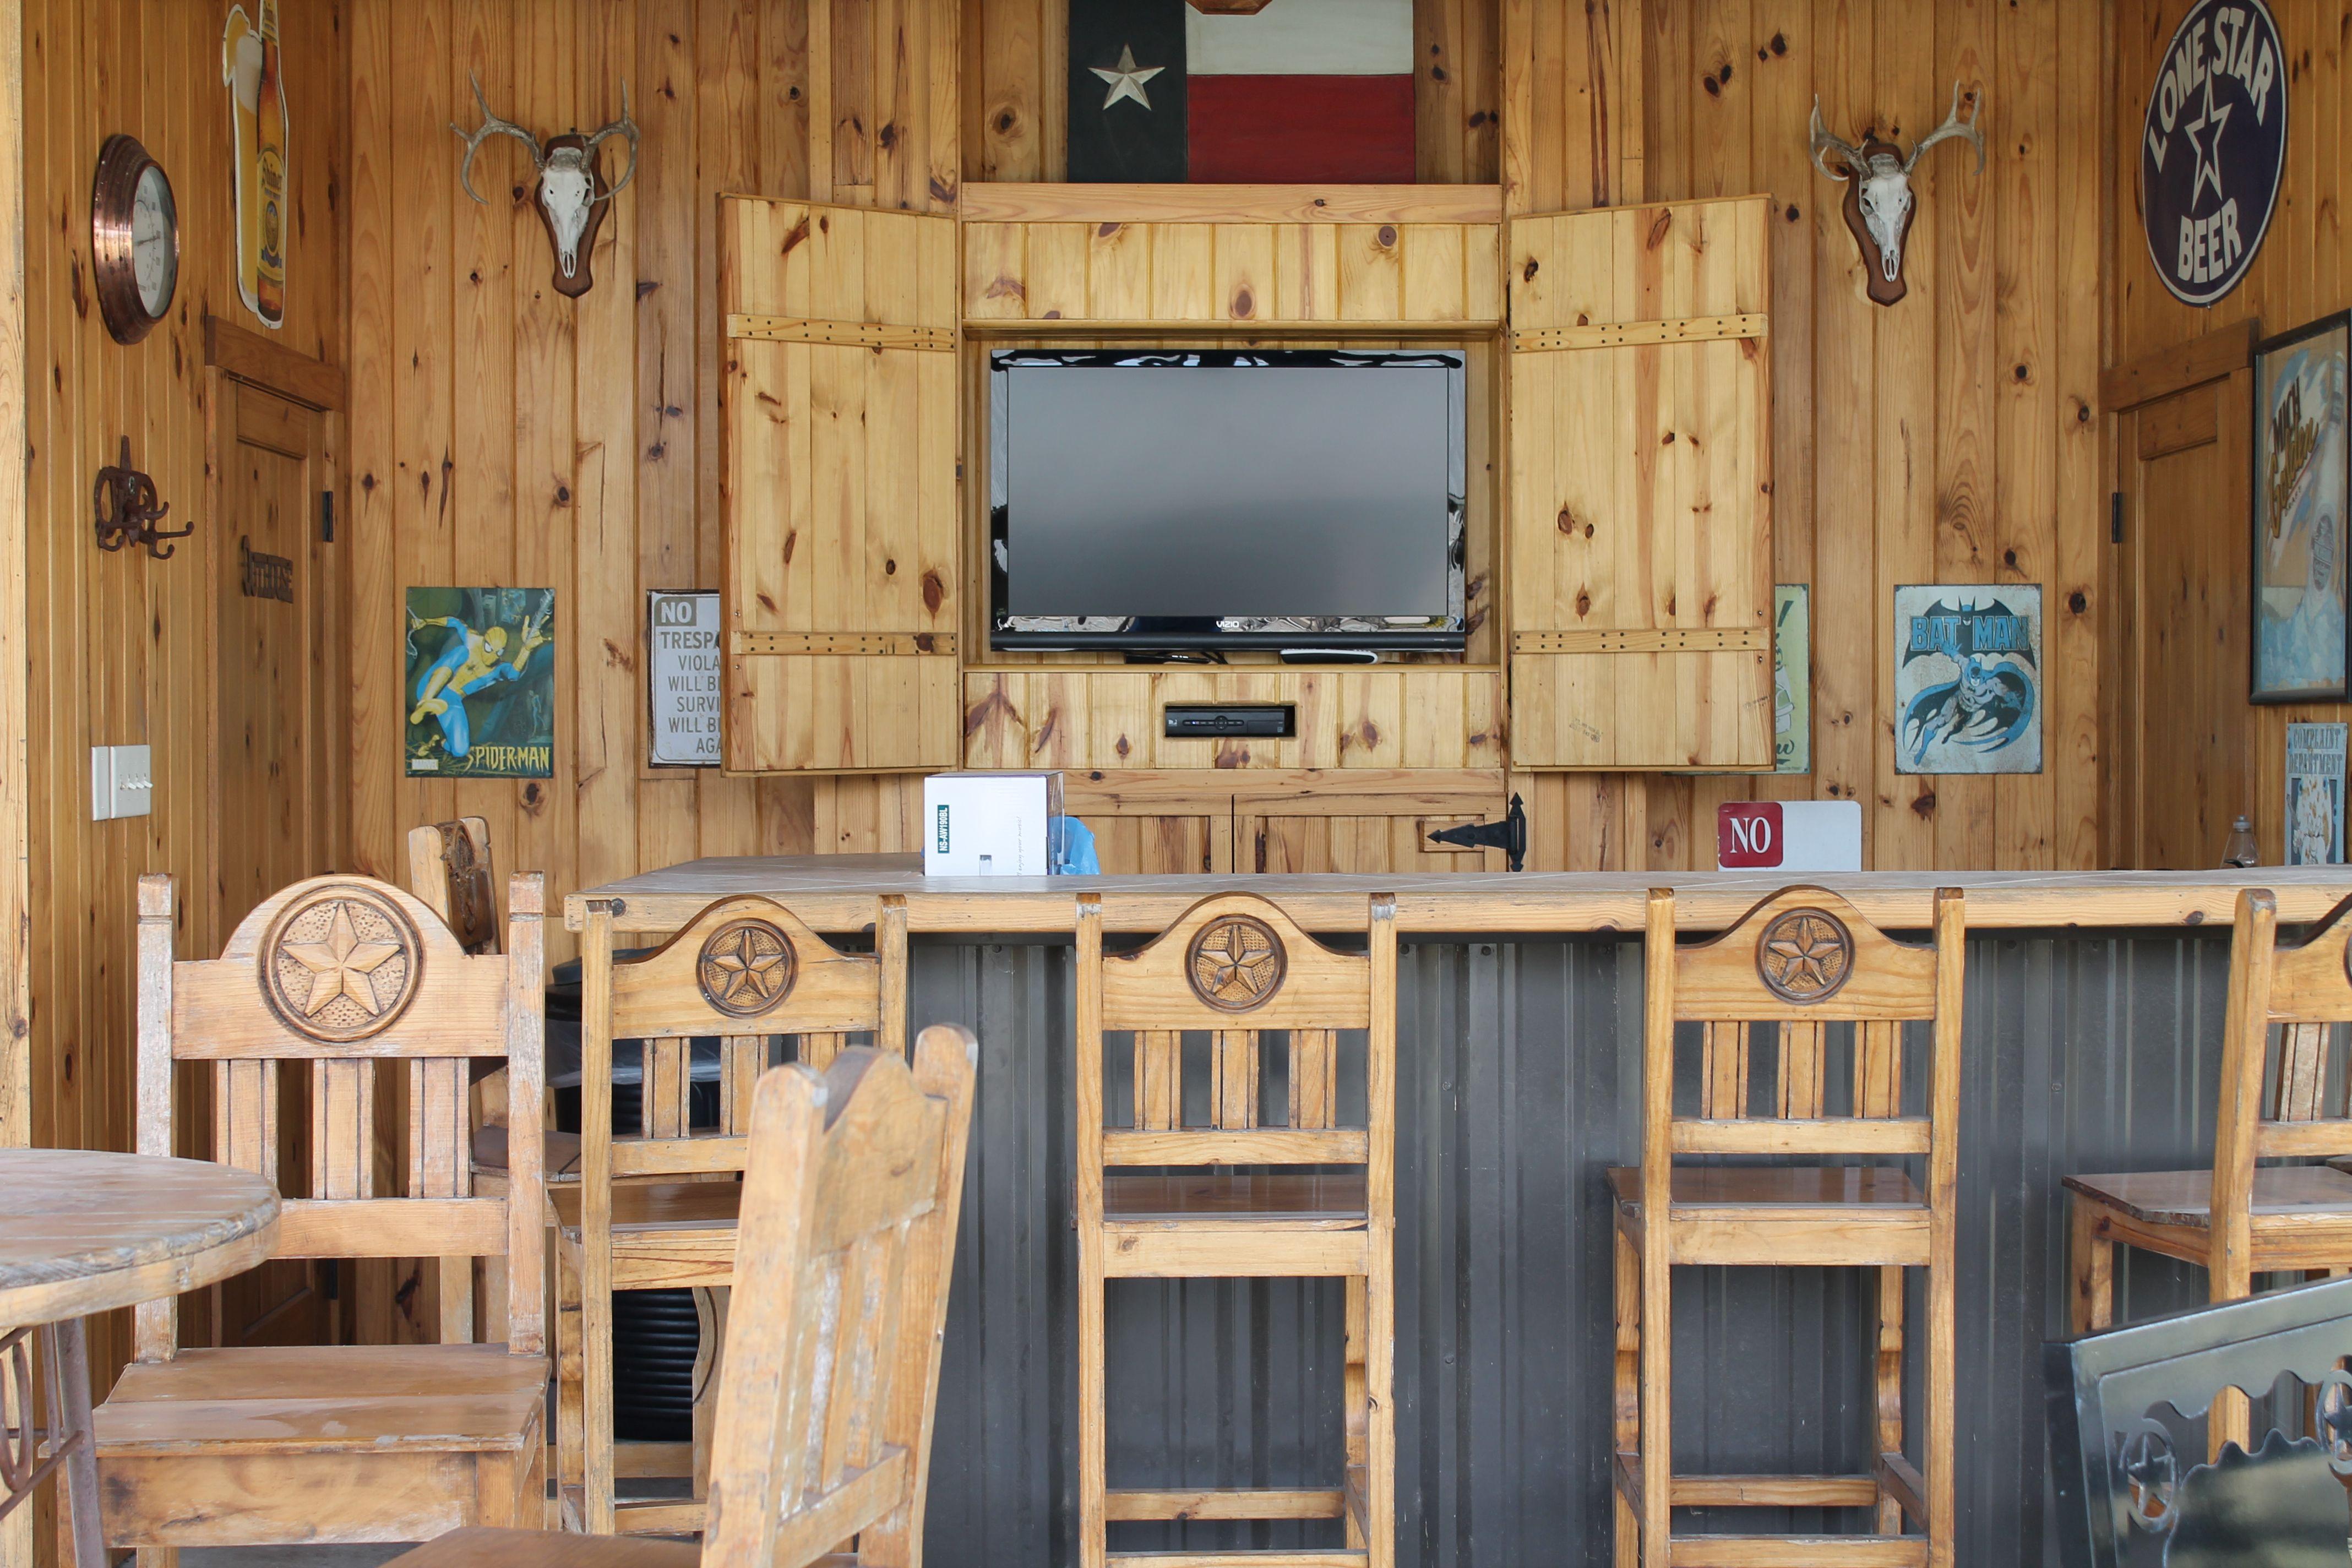 Western Patio Design With Saloon Bar Decor Home